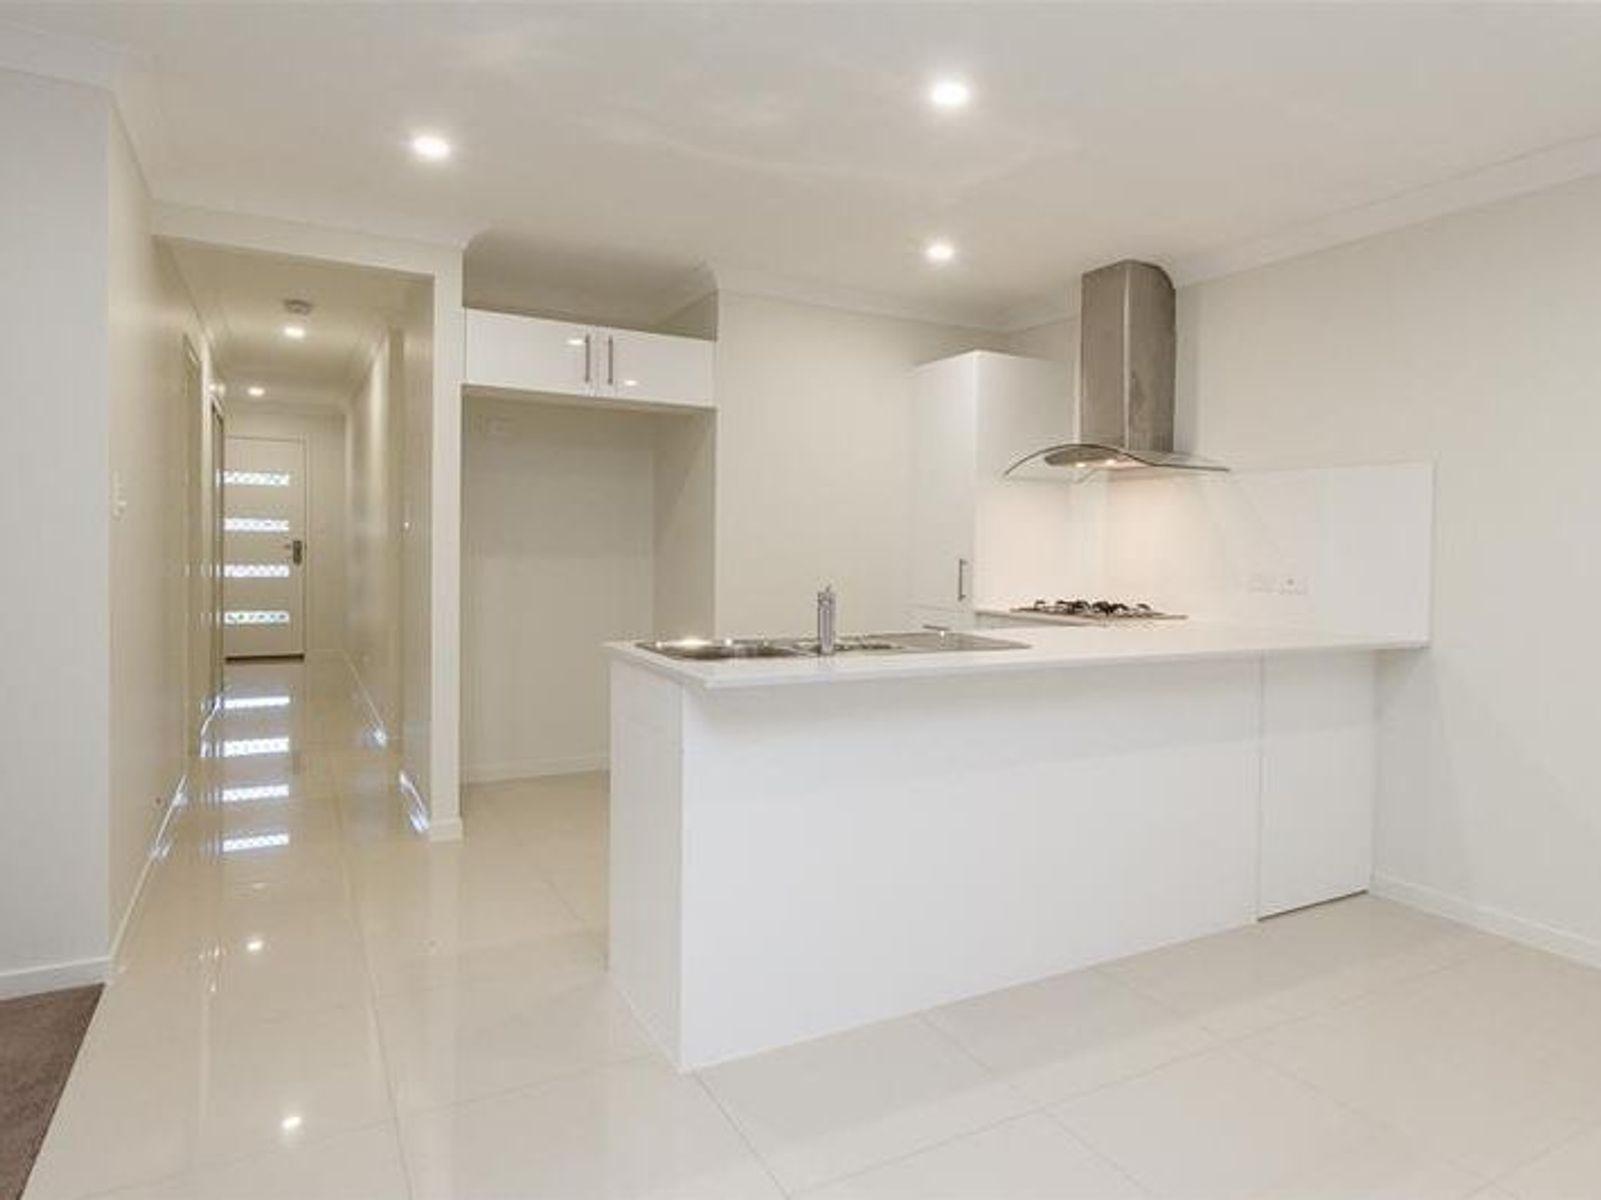 7A Bizet Court, Oxenford, QLD 4210